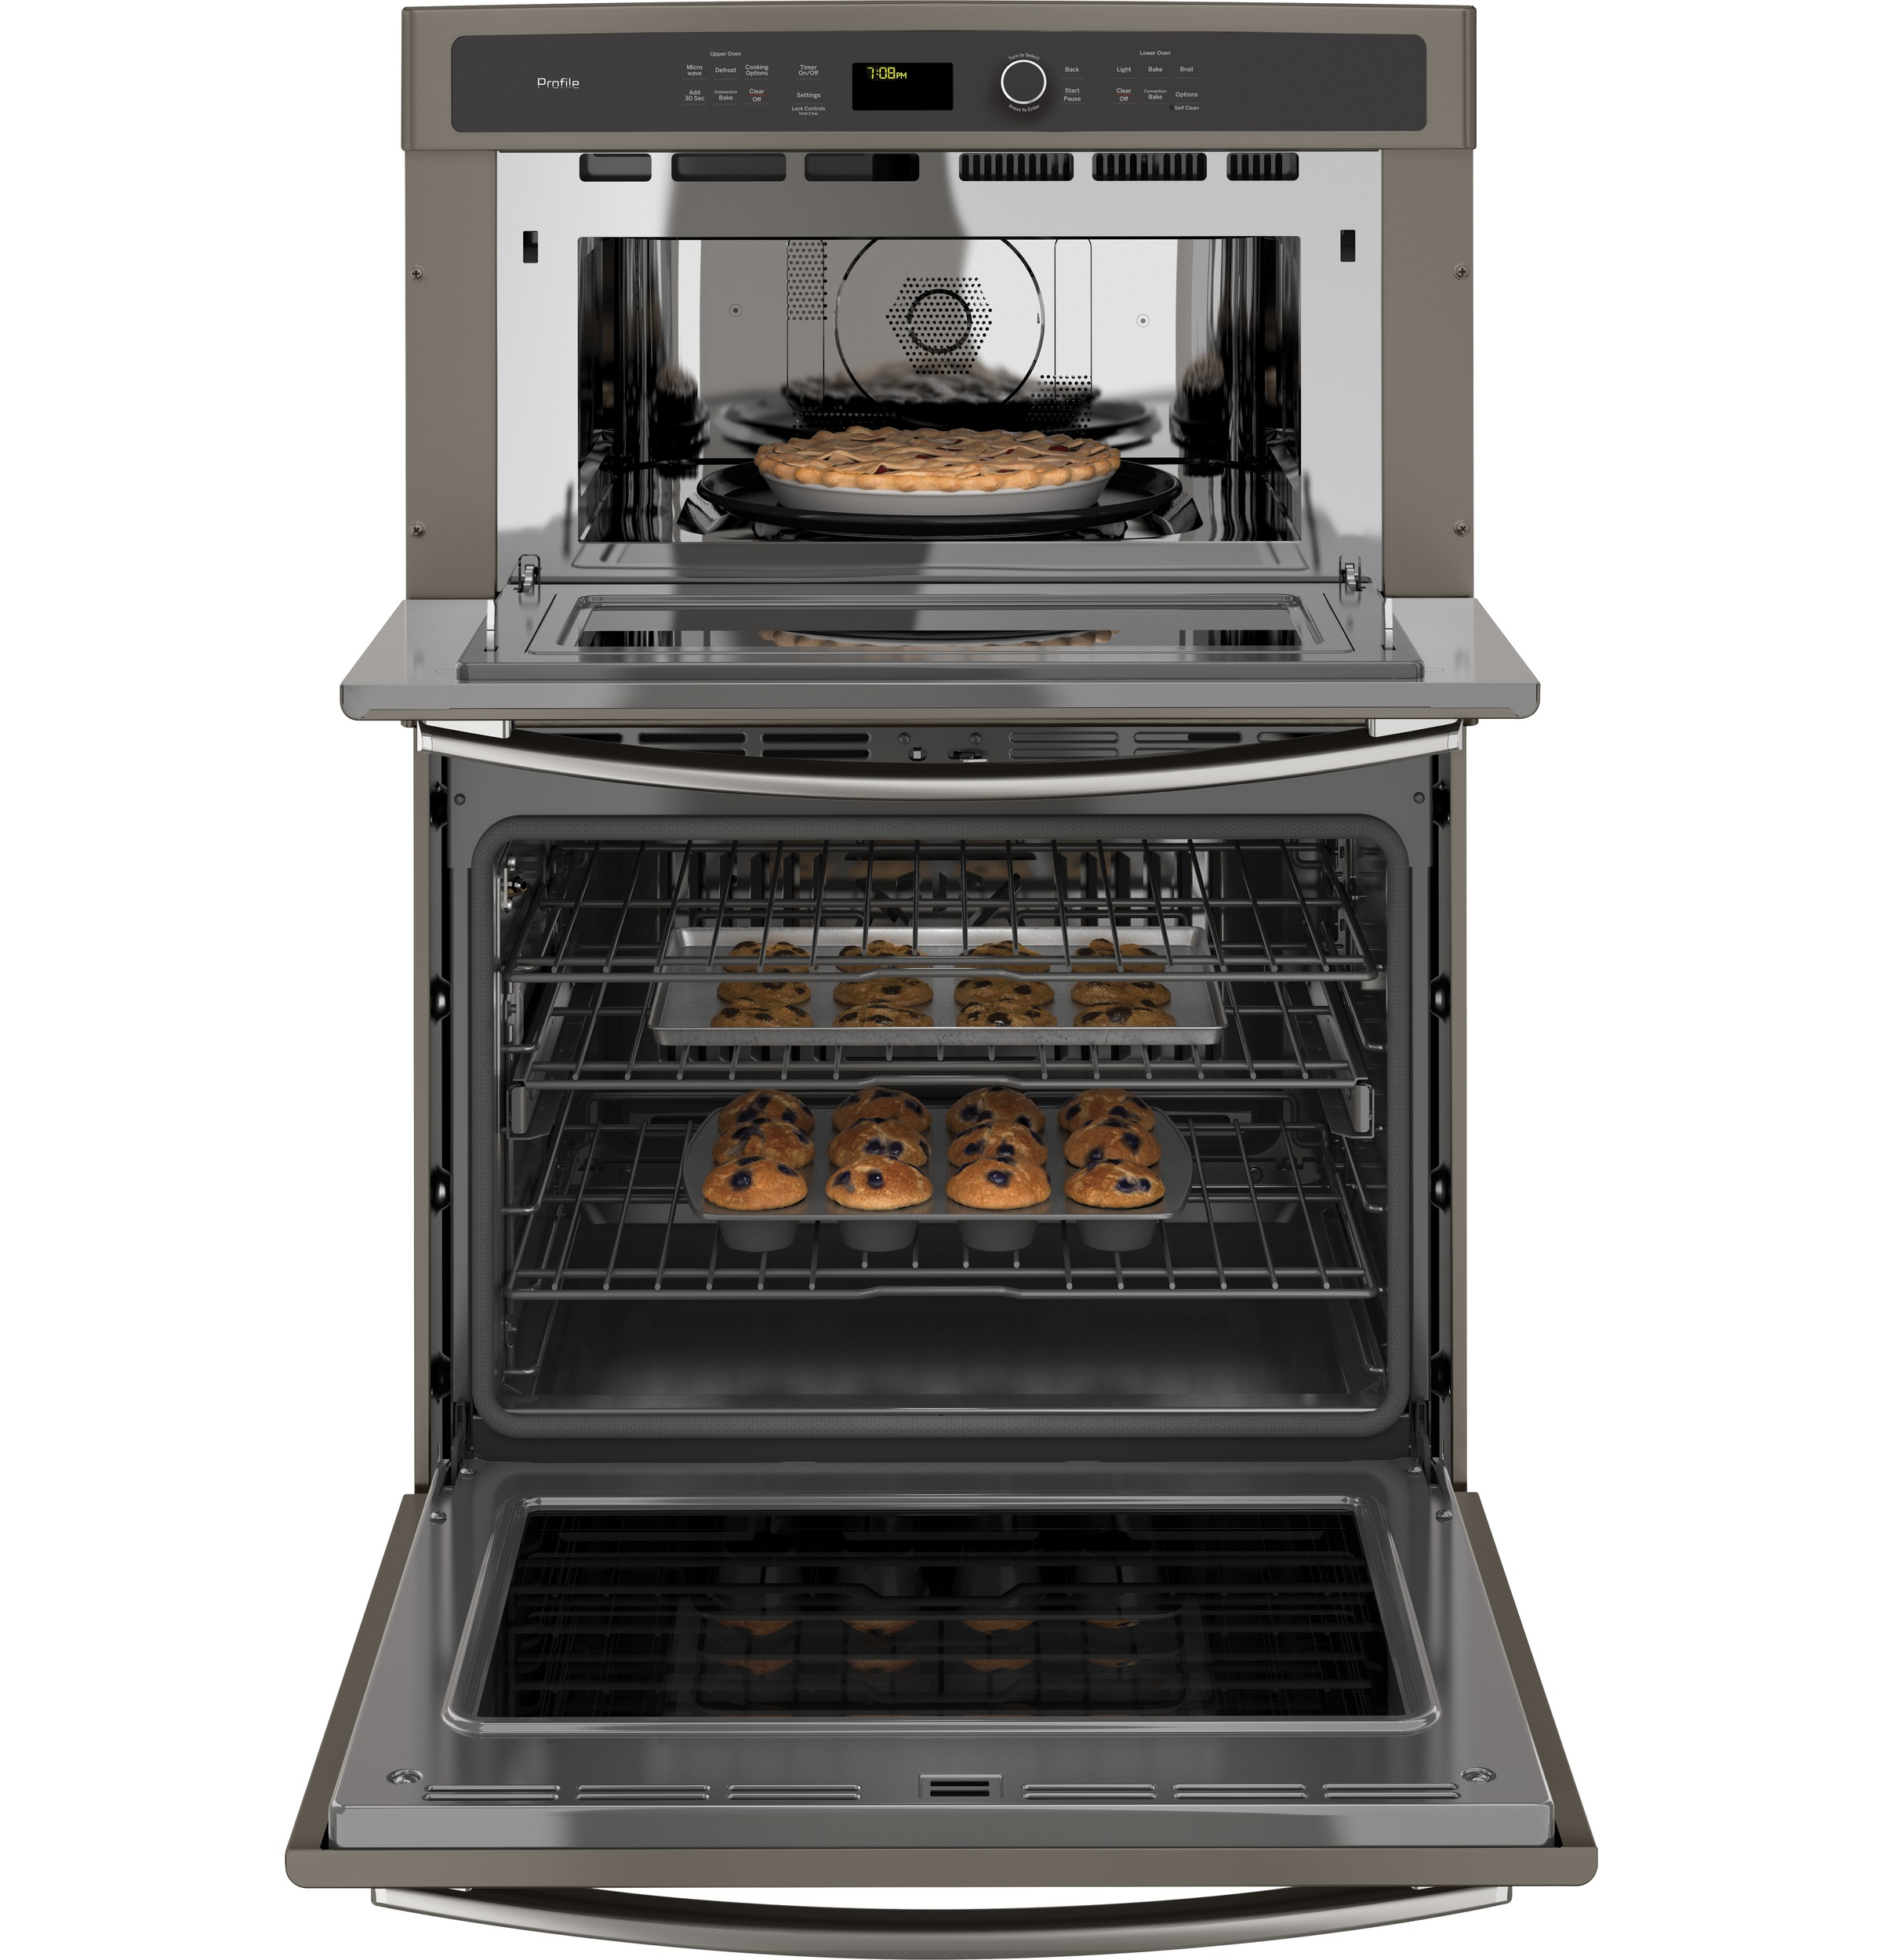 Model: PT7800EKES | GE Profile™ Series 30